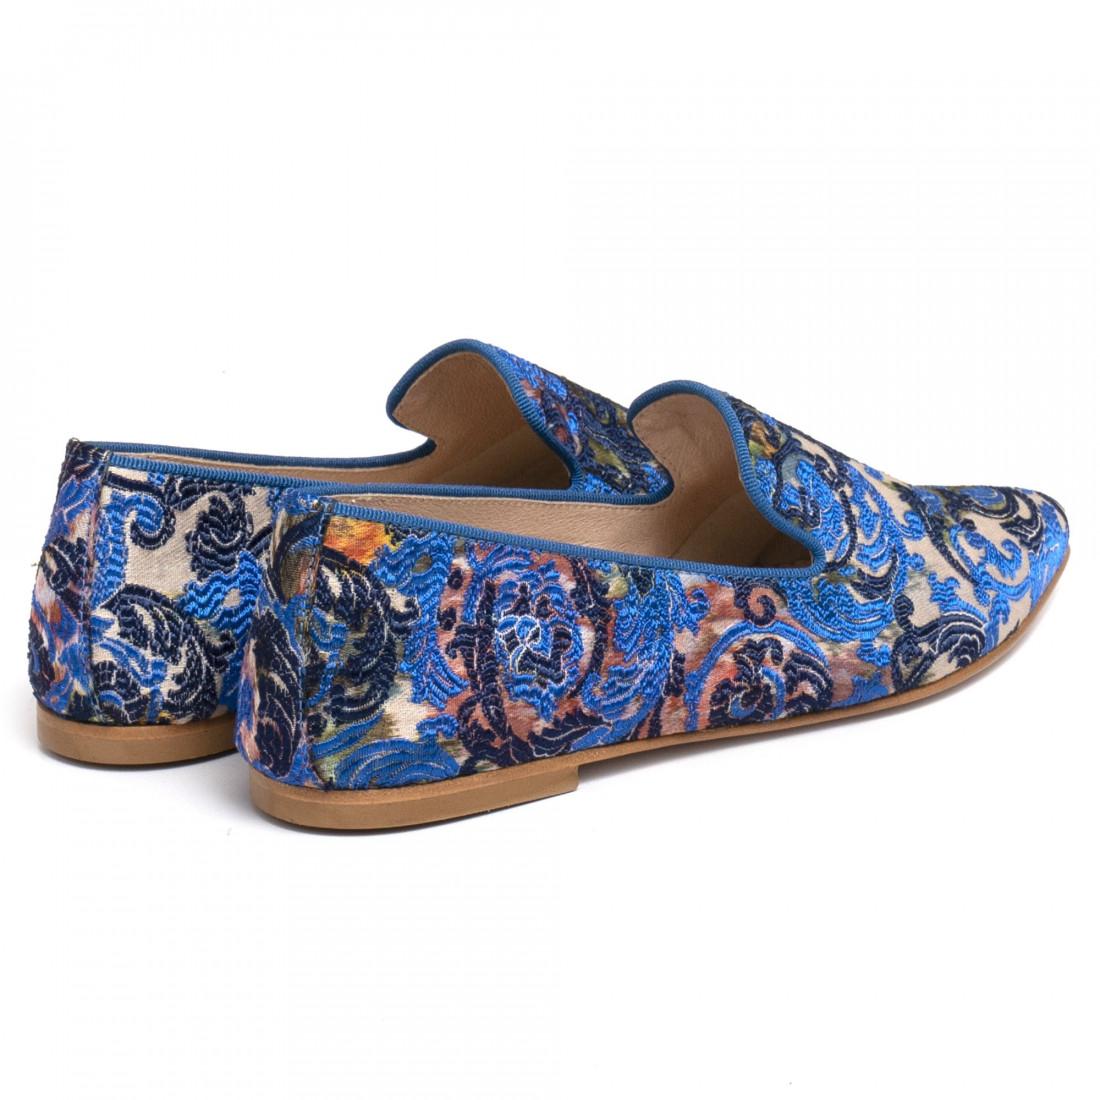 loafers woman ballerina e548tuc blu 7245